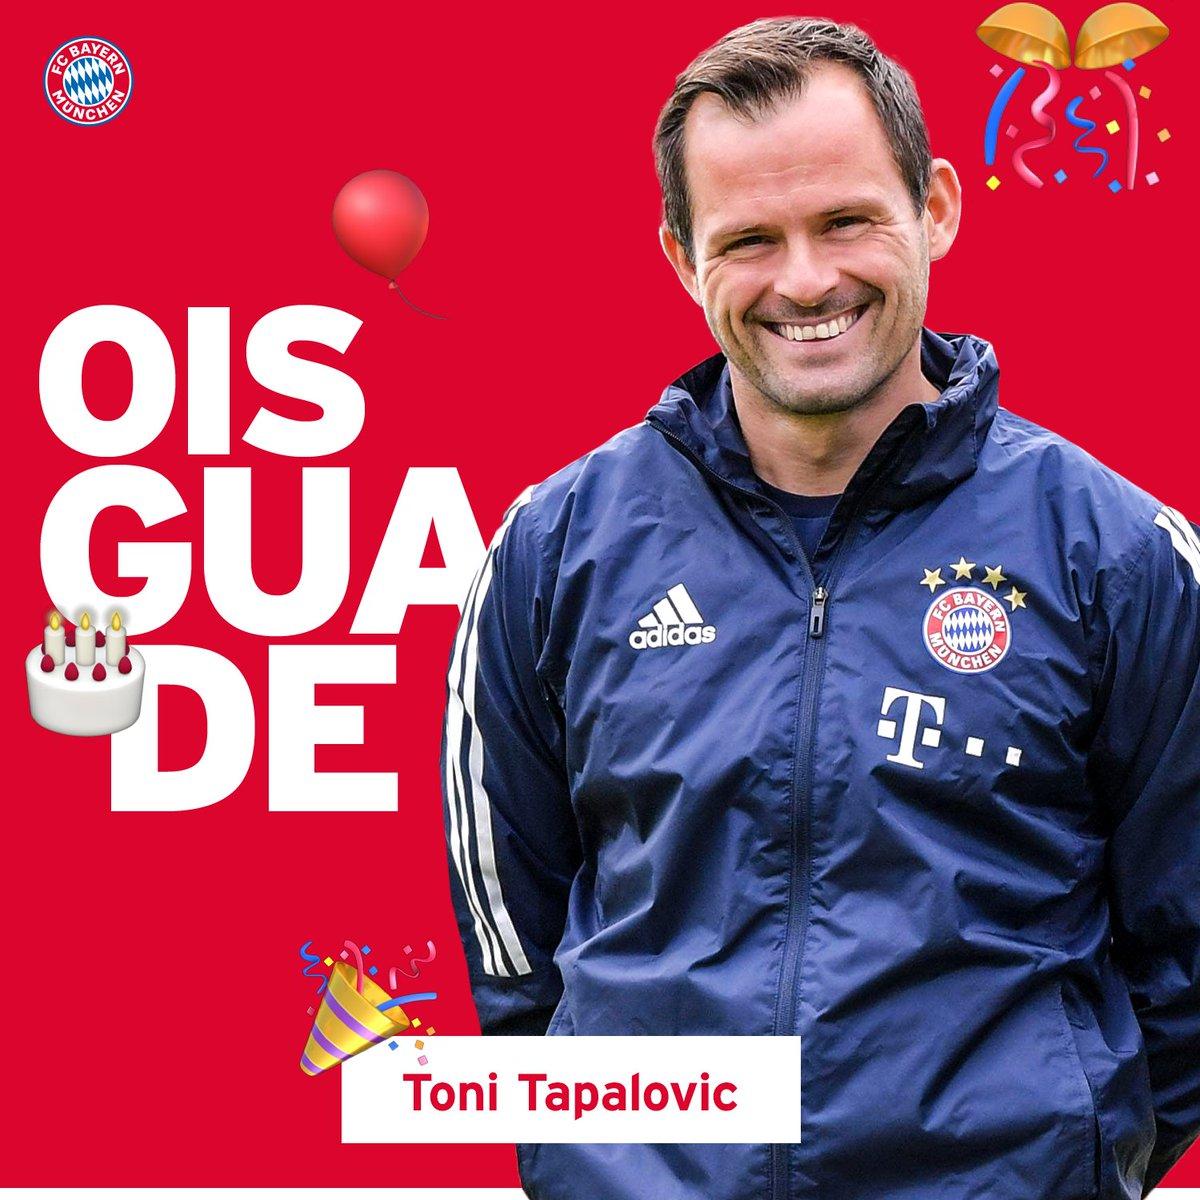 RT @FCBayern: Happy Birthday, Toni #Tapalovic! 👌🎉🎀 https://t.co/ITyX3GJsbe